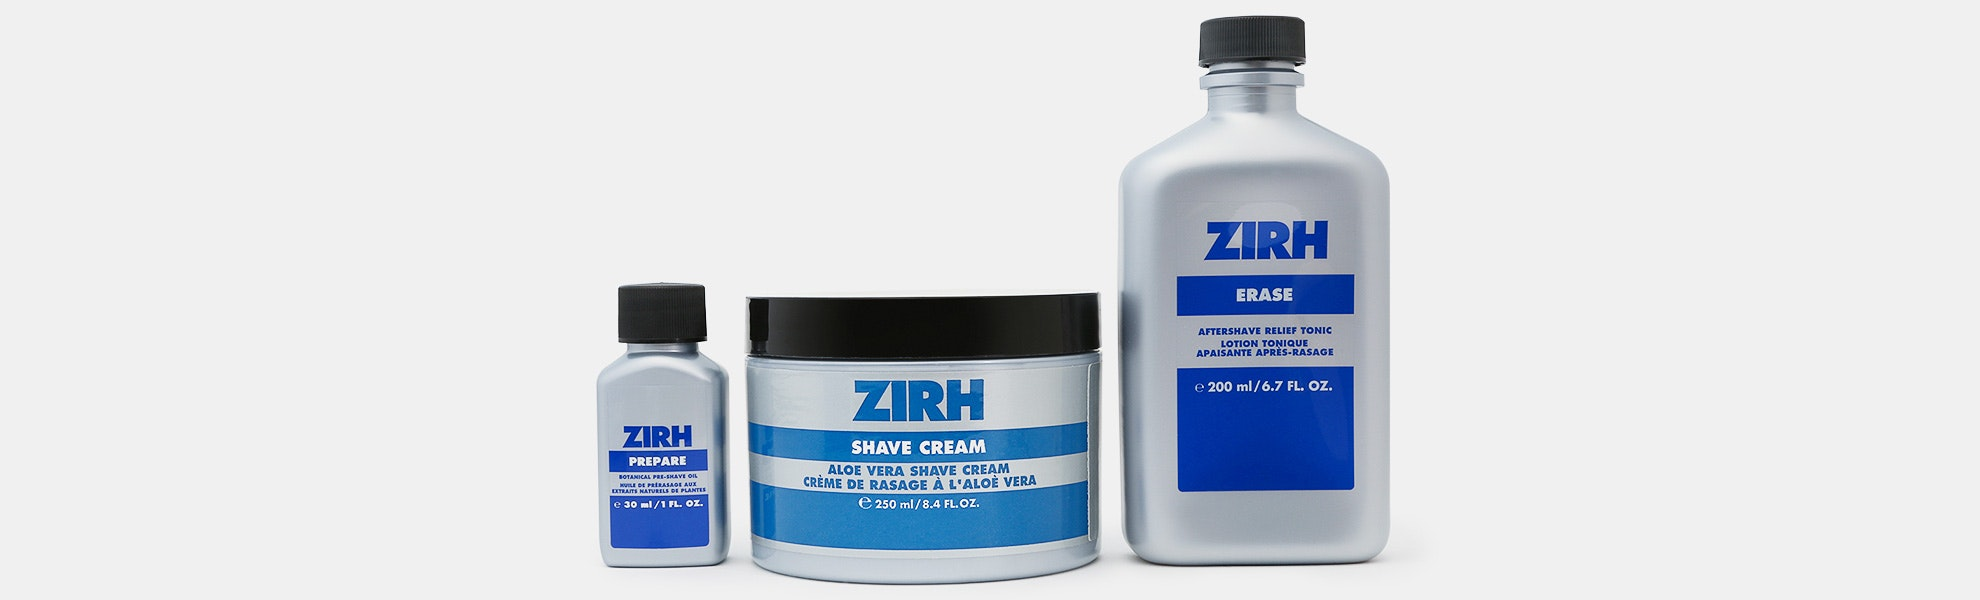 Zirh Shave Set